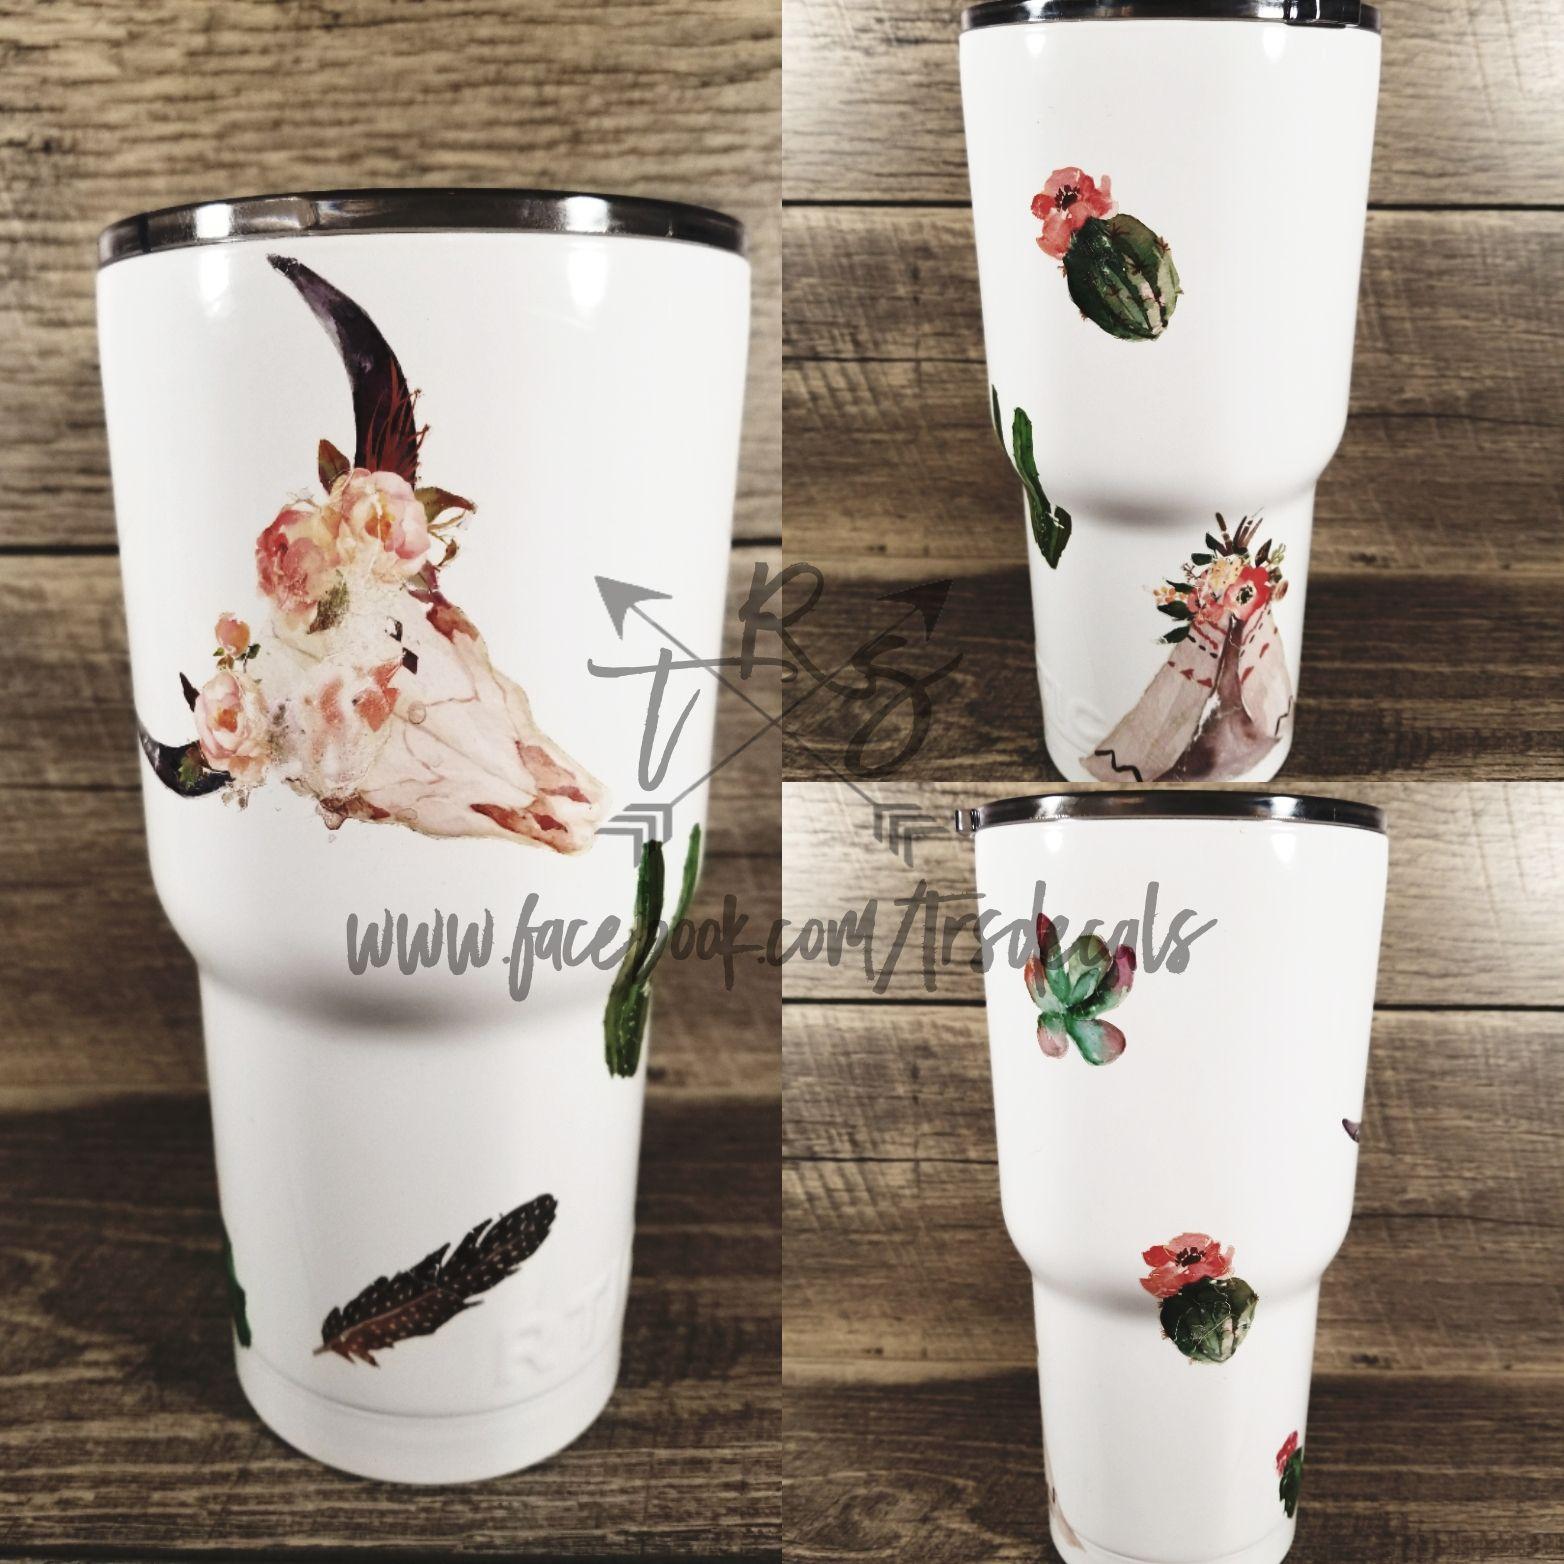 Custom Yeti Rtic Ozark Powder Coated Tumbler Boho Chic Cactus Yeti Cup Designs Powder Coated Tumblers Tumbler Cups Diy